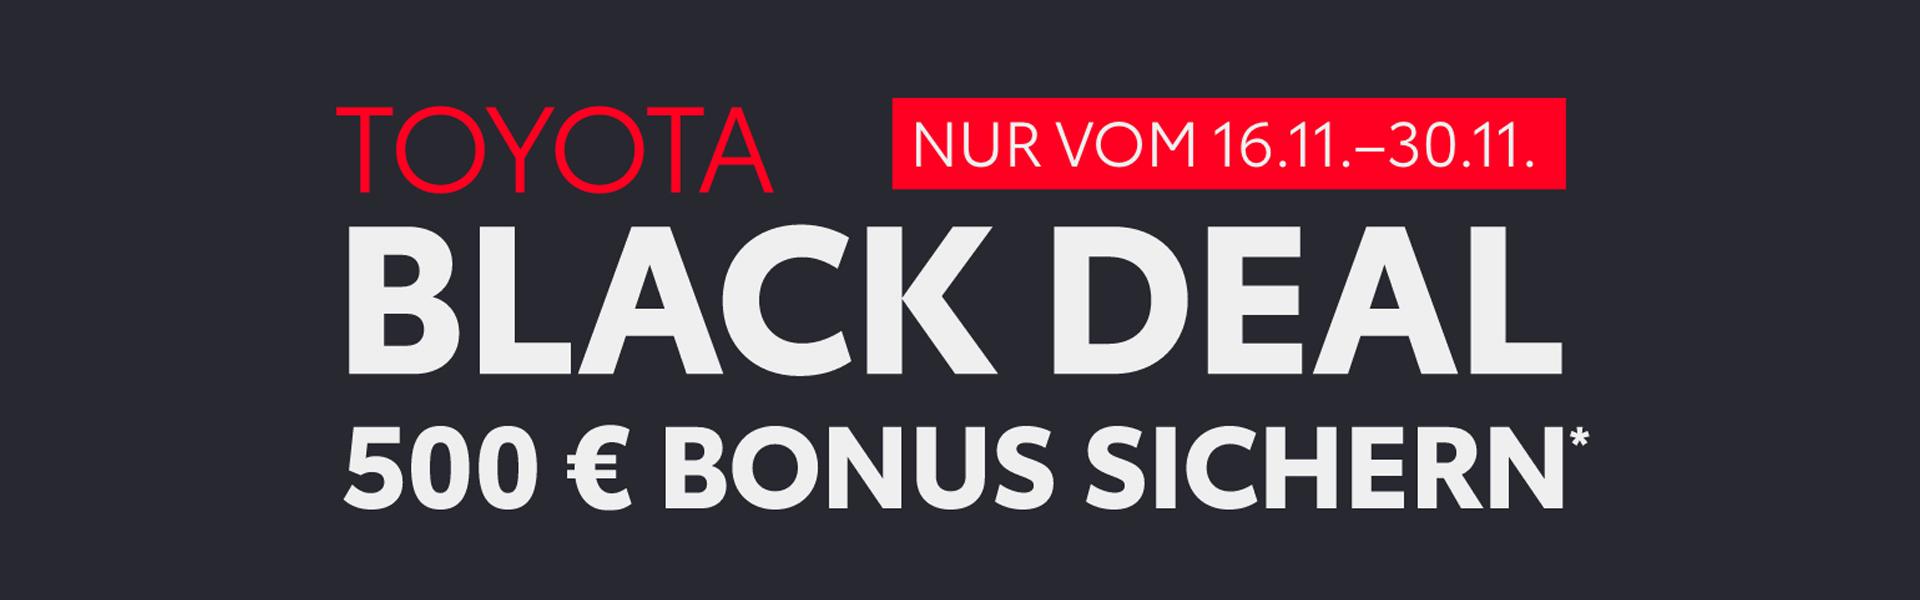 Toyota Black Deal